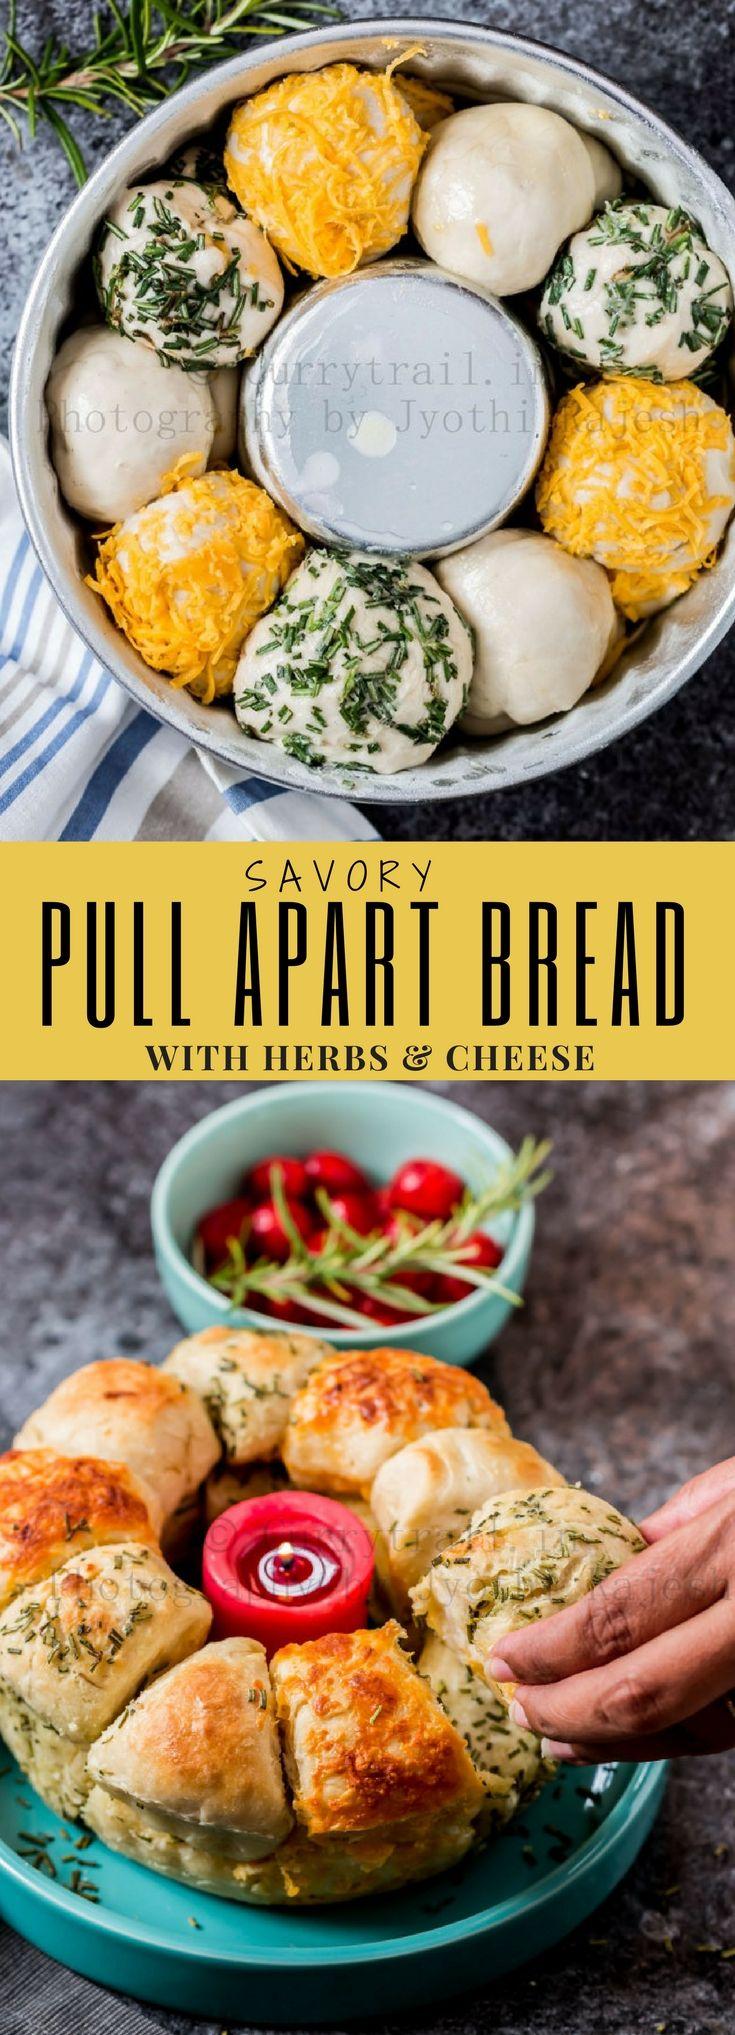 Cheesy Garlic and Herb Pull Apart Bread pin